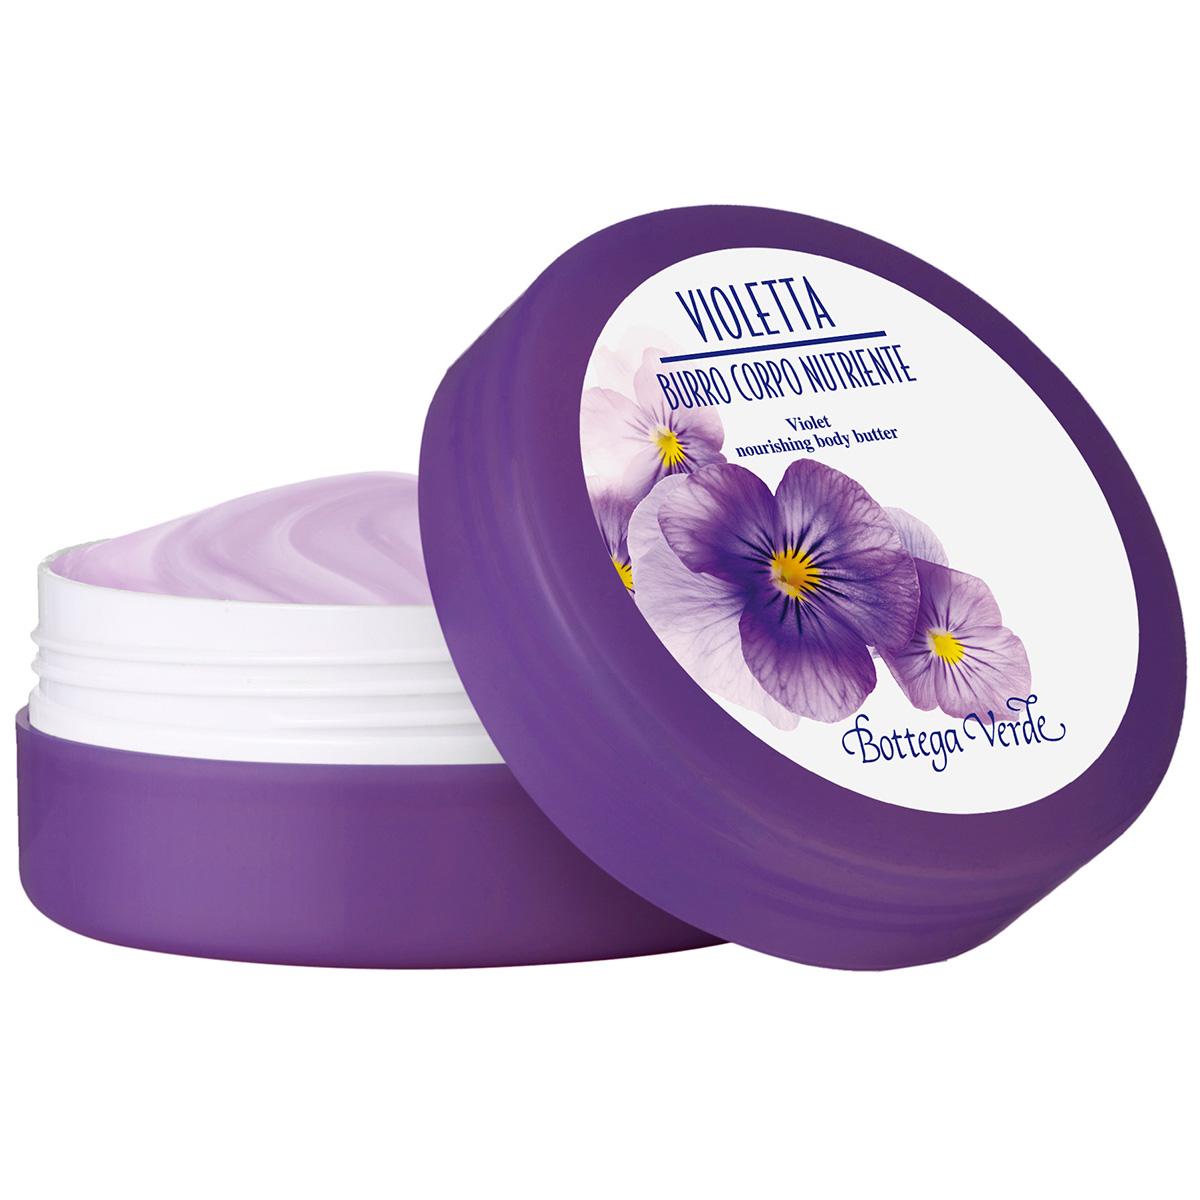 Unt de corp cu extract de violete - Violetta, 125 ML